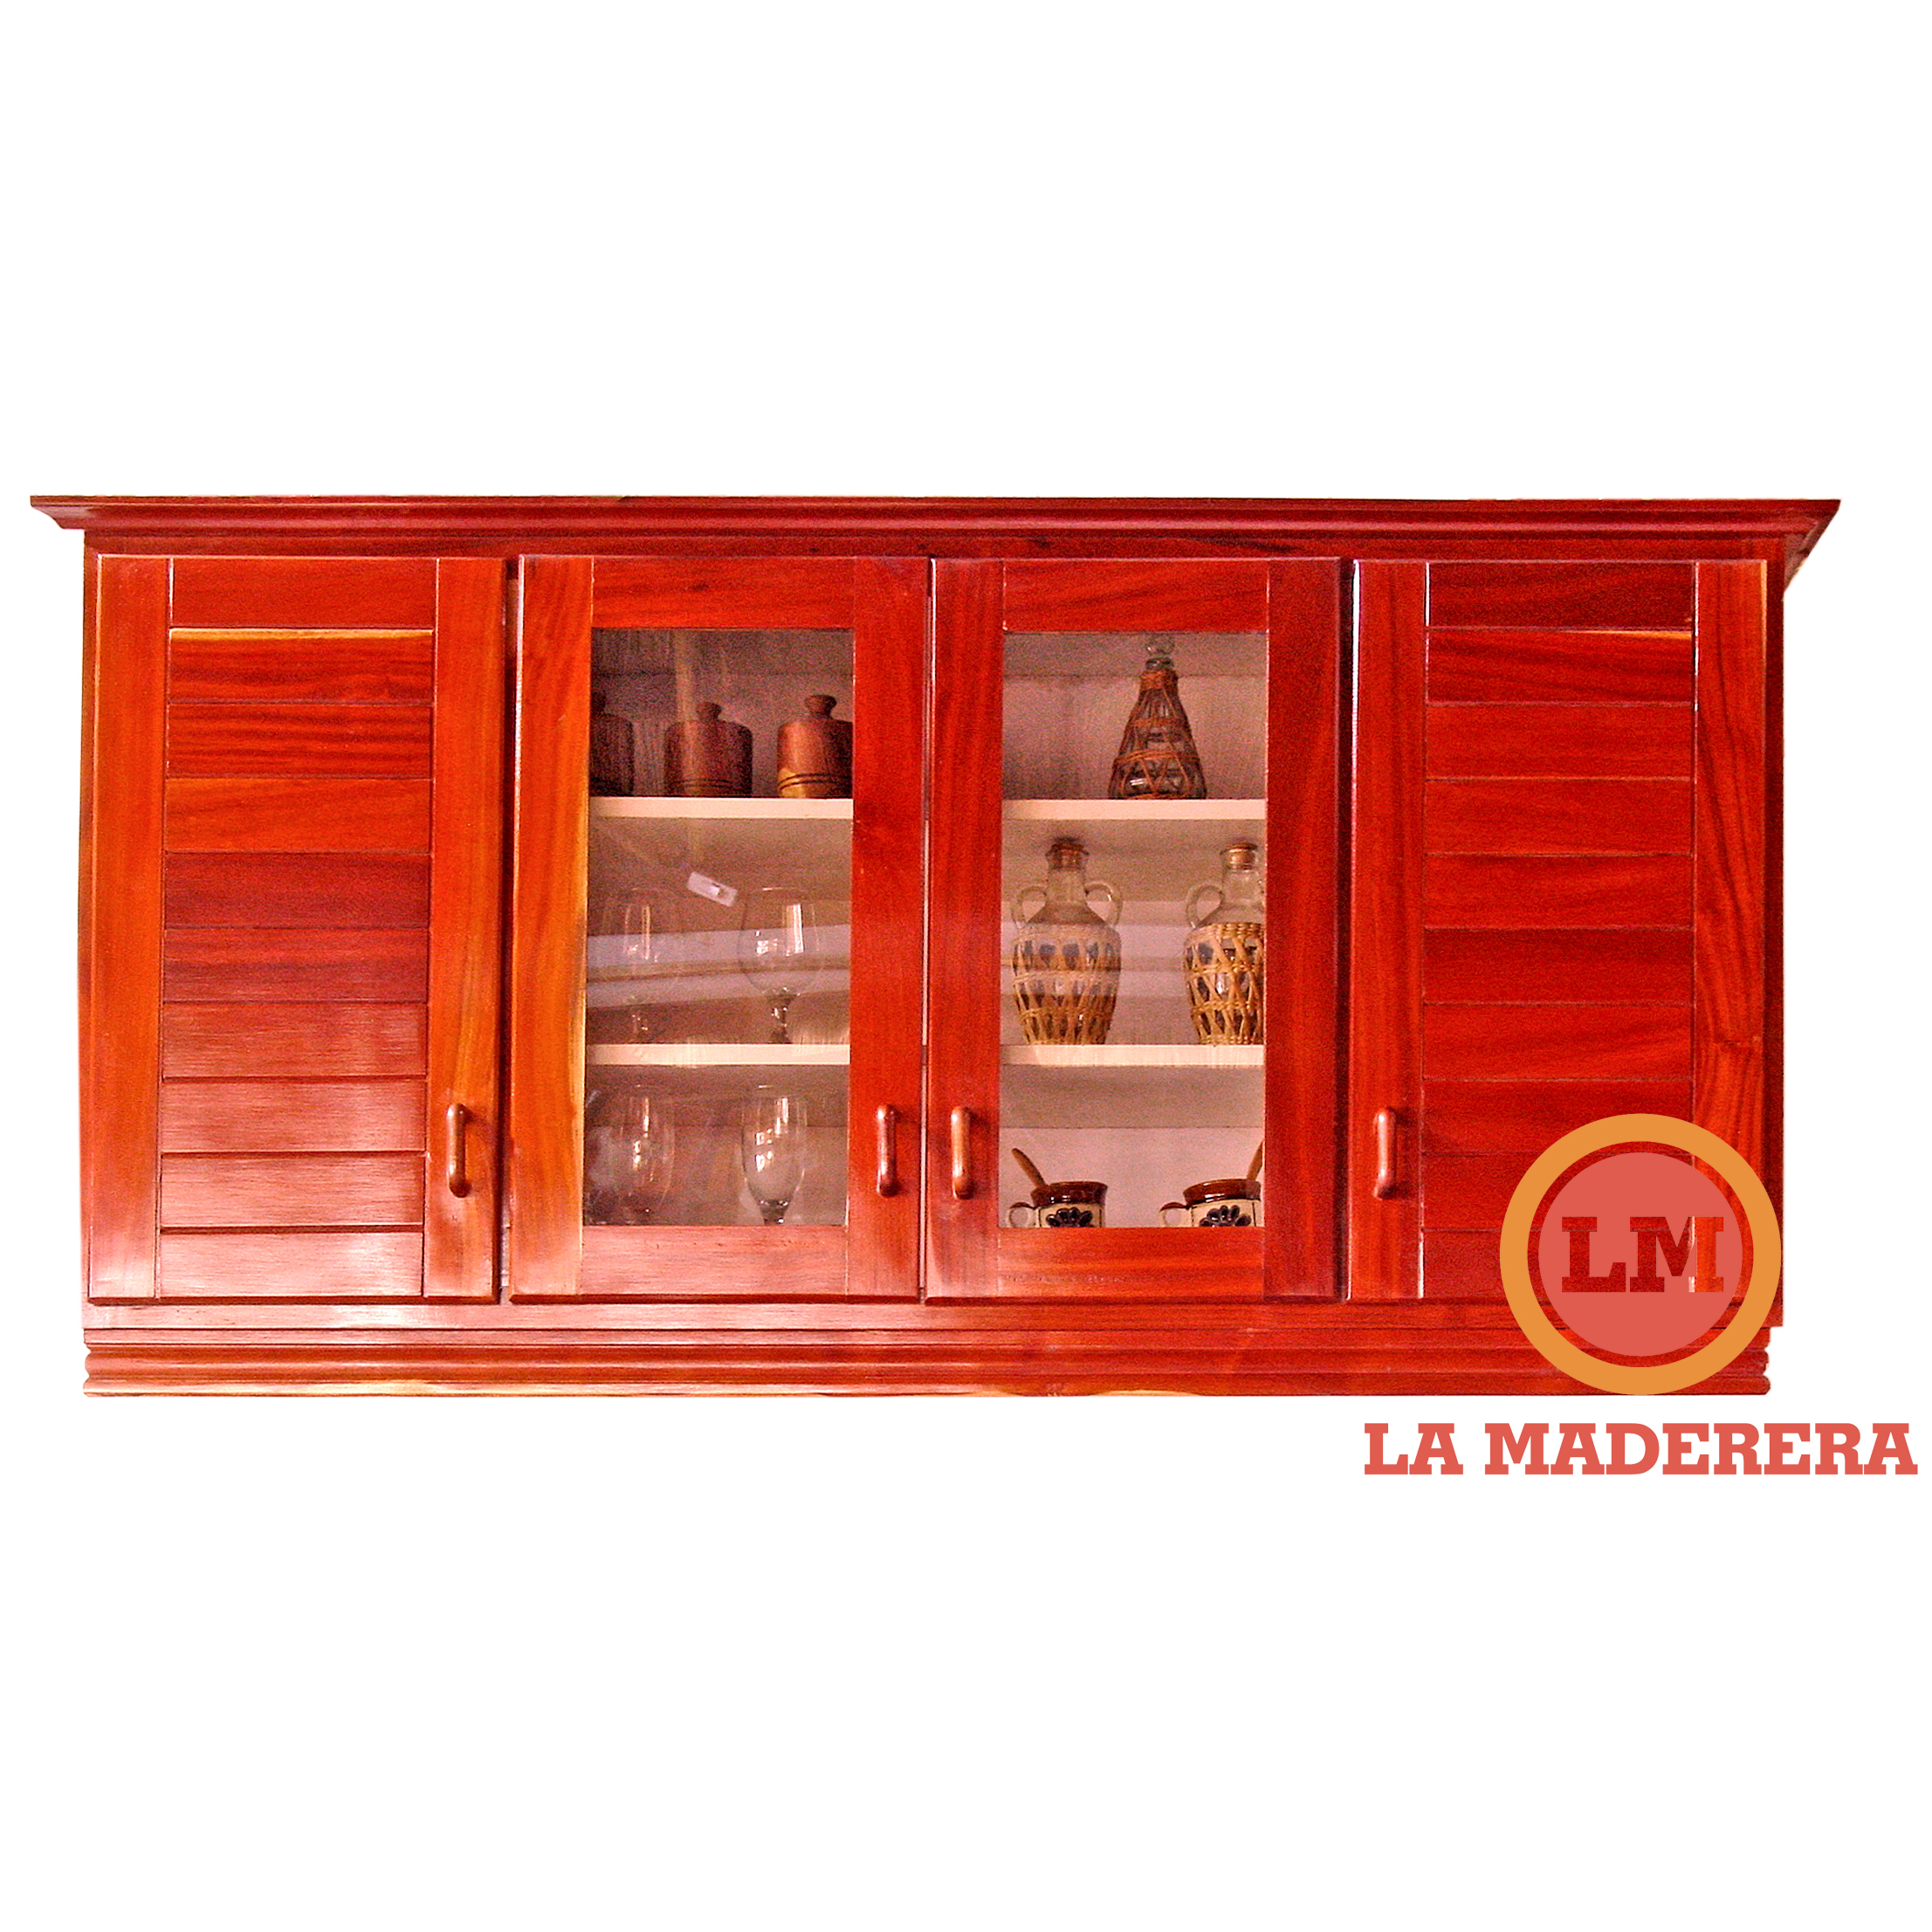 Alacenas para cocina a medida en quebracho colorado la maderera - Alacenas de madera para cocina ...